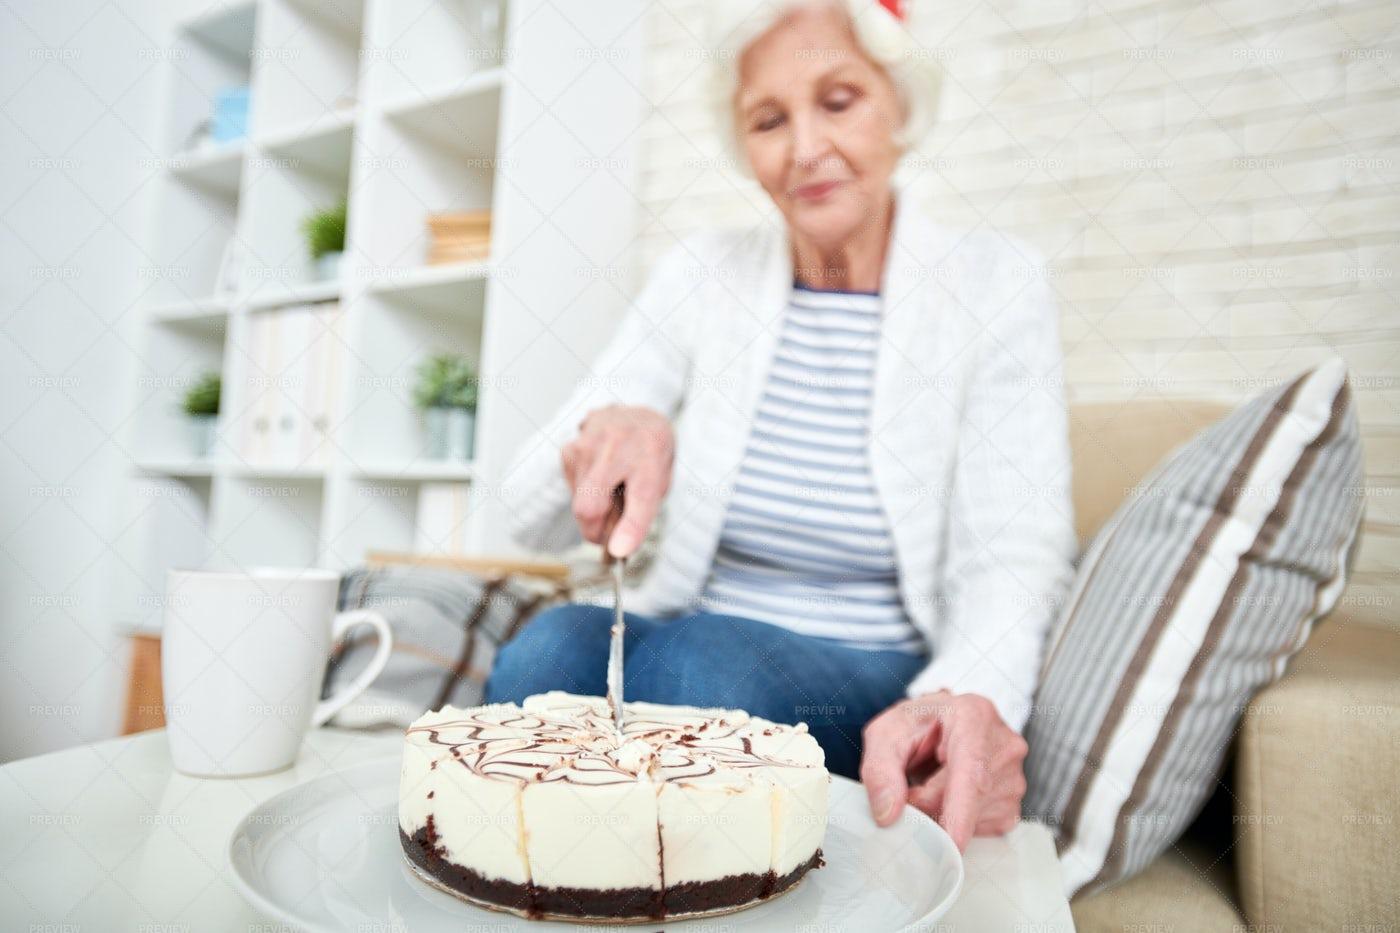 Senior Woman Celebrating Birthday...: Stock Photos